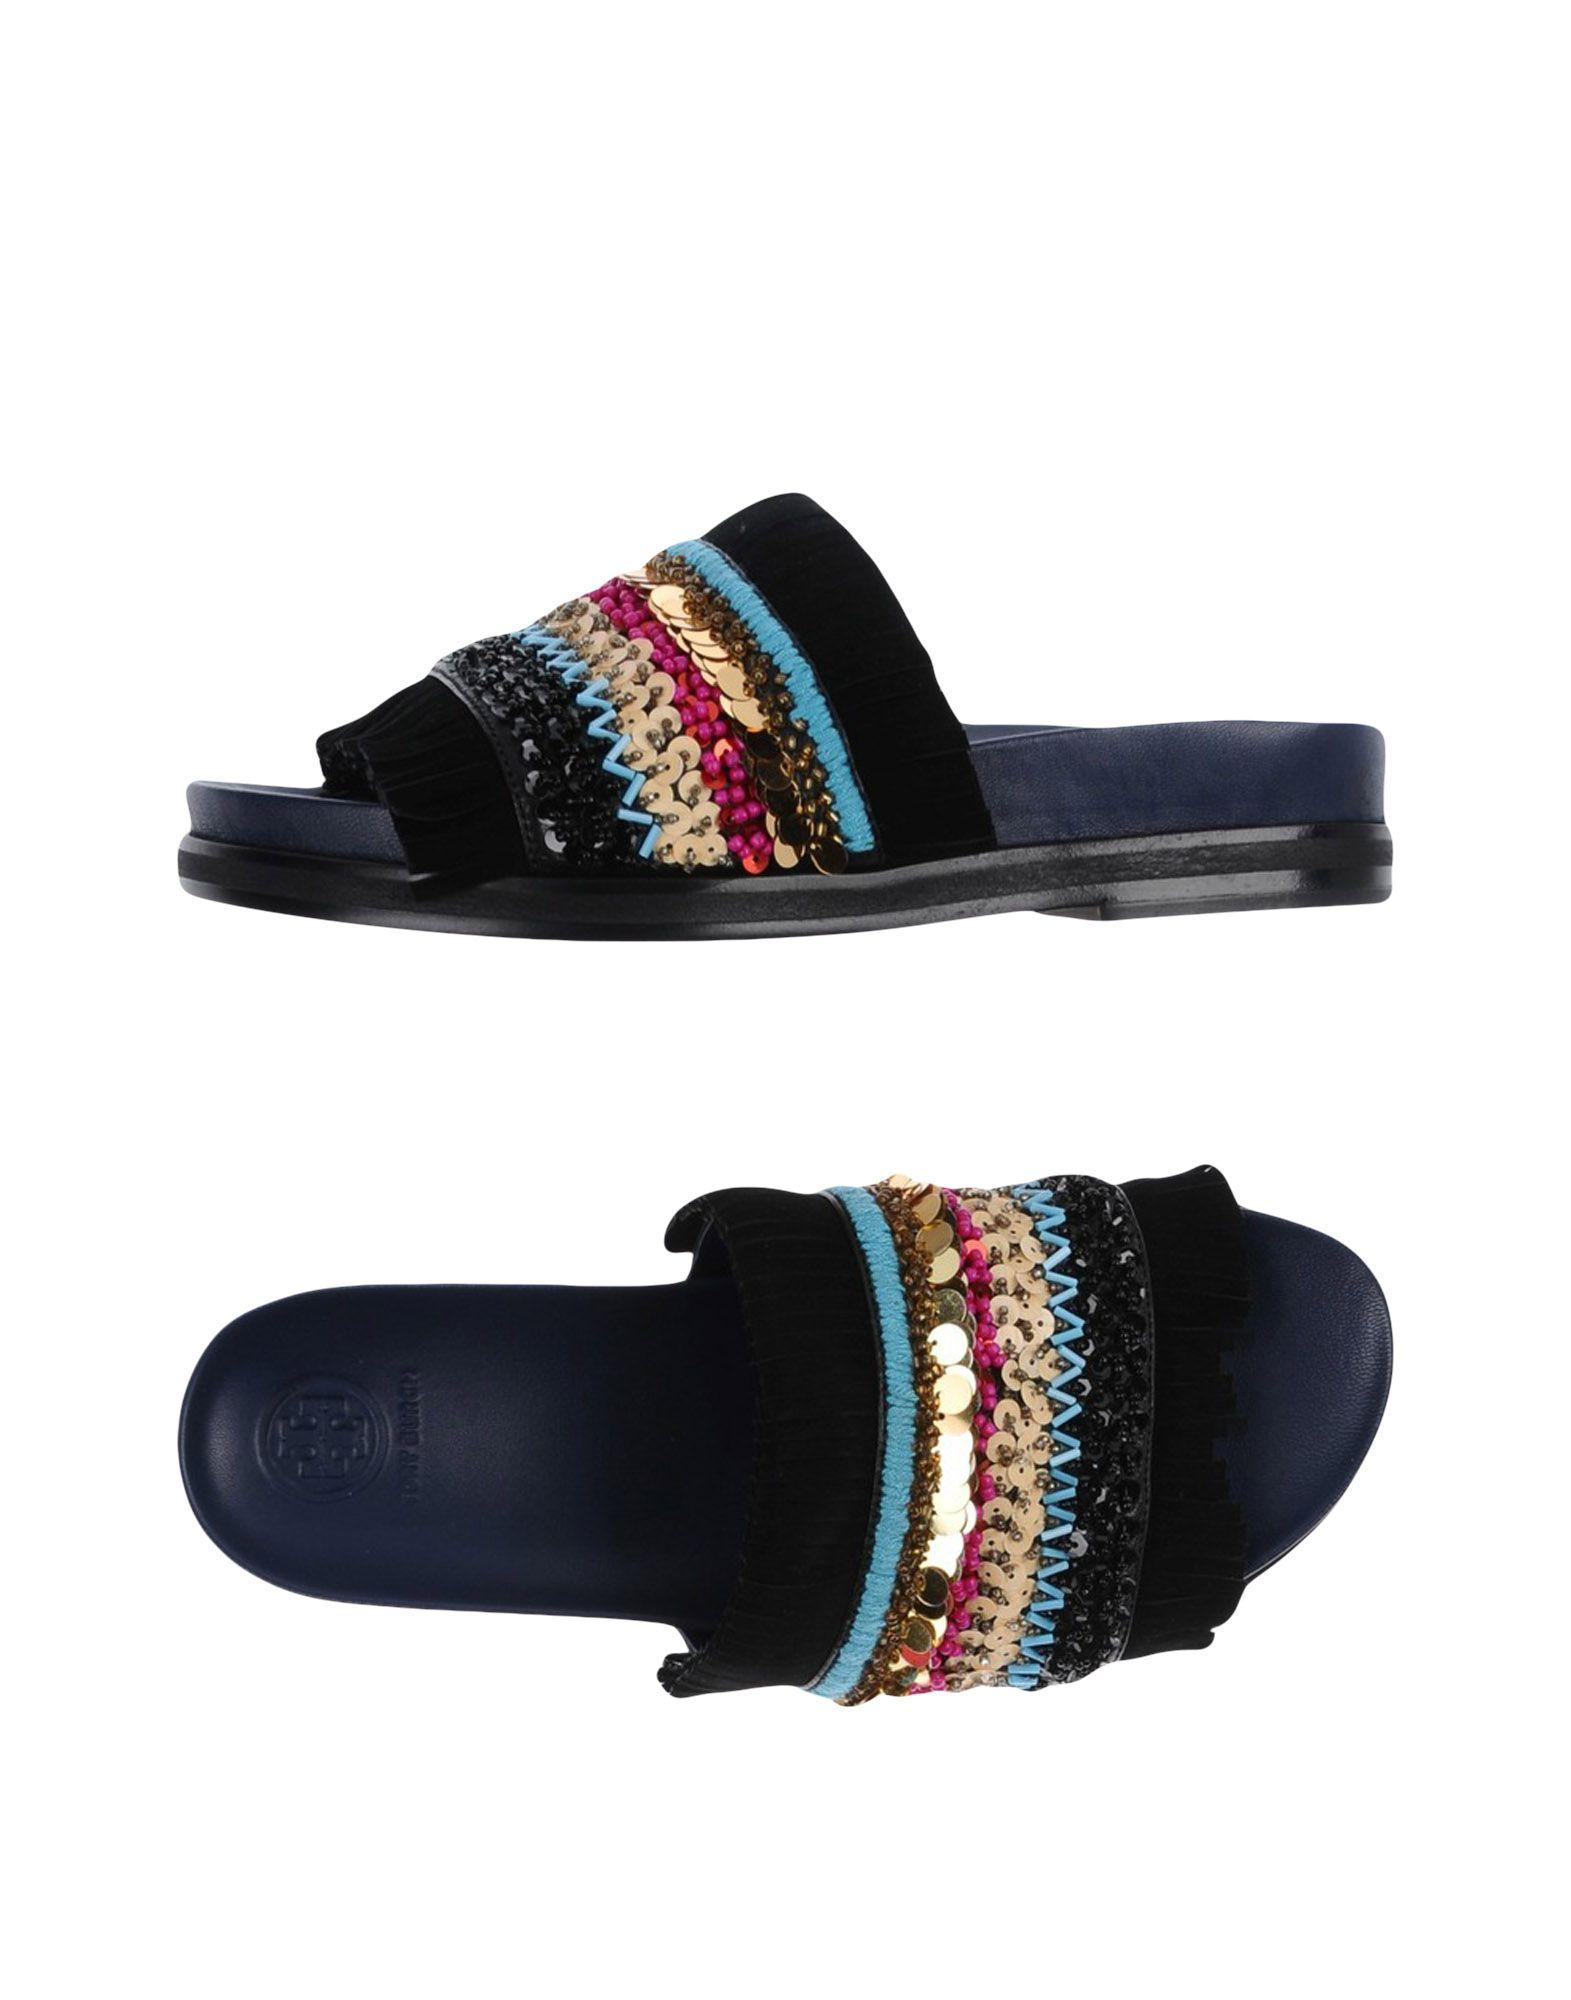 Tory Burch Sandalen Damen  11429568LKGut aussehende strapazierfähige Schuhe